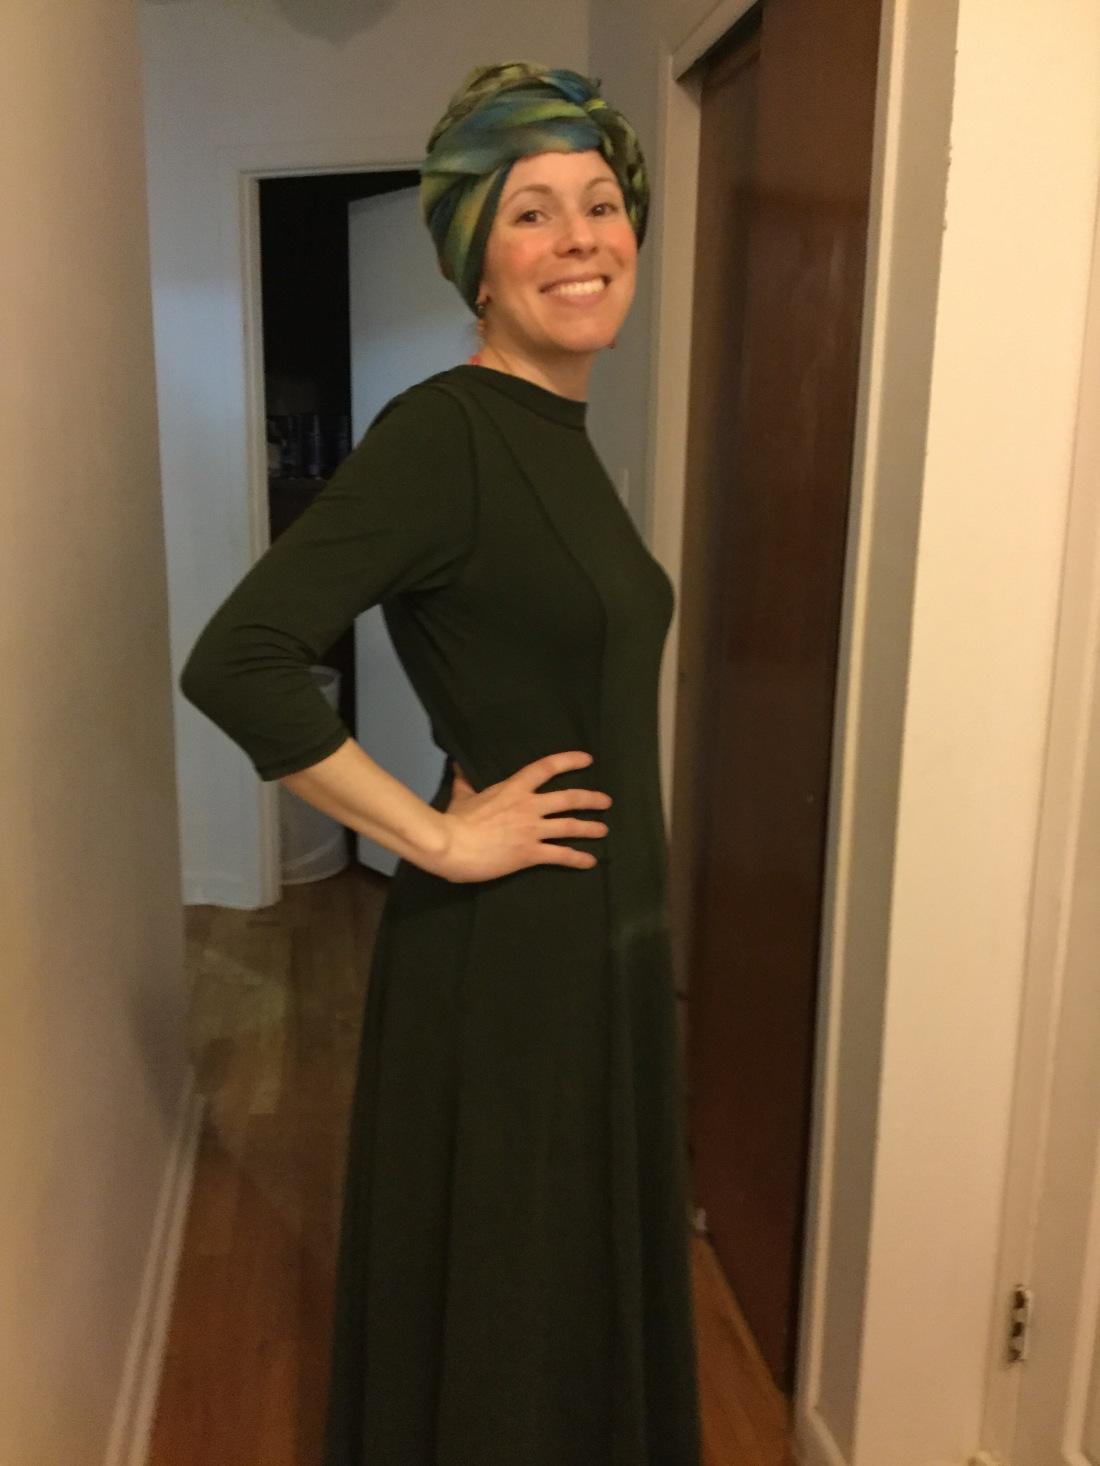 Tummy- dress